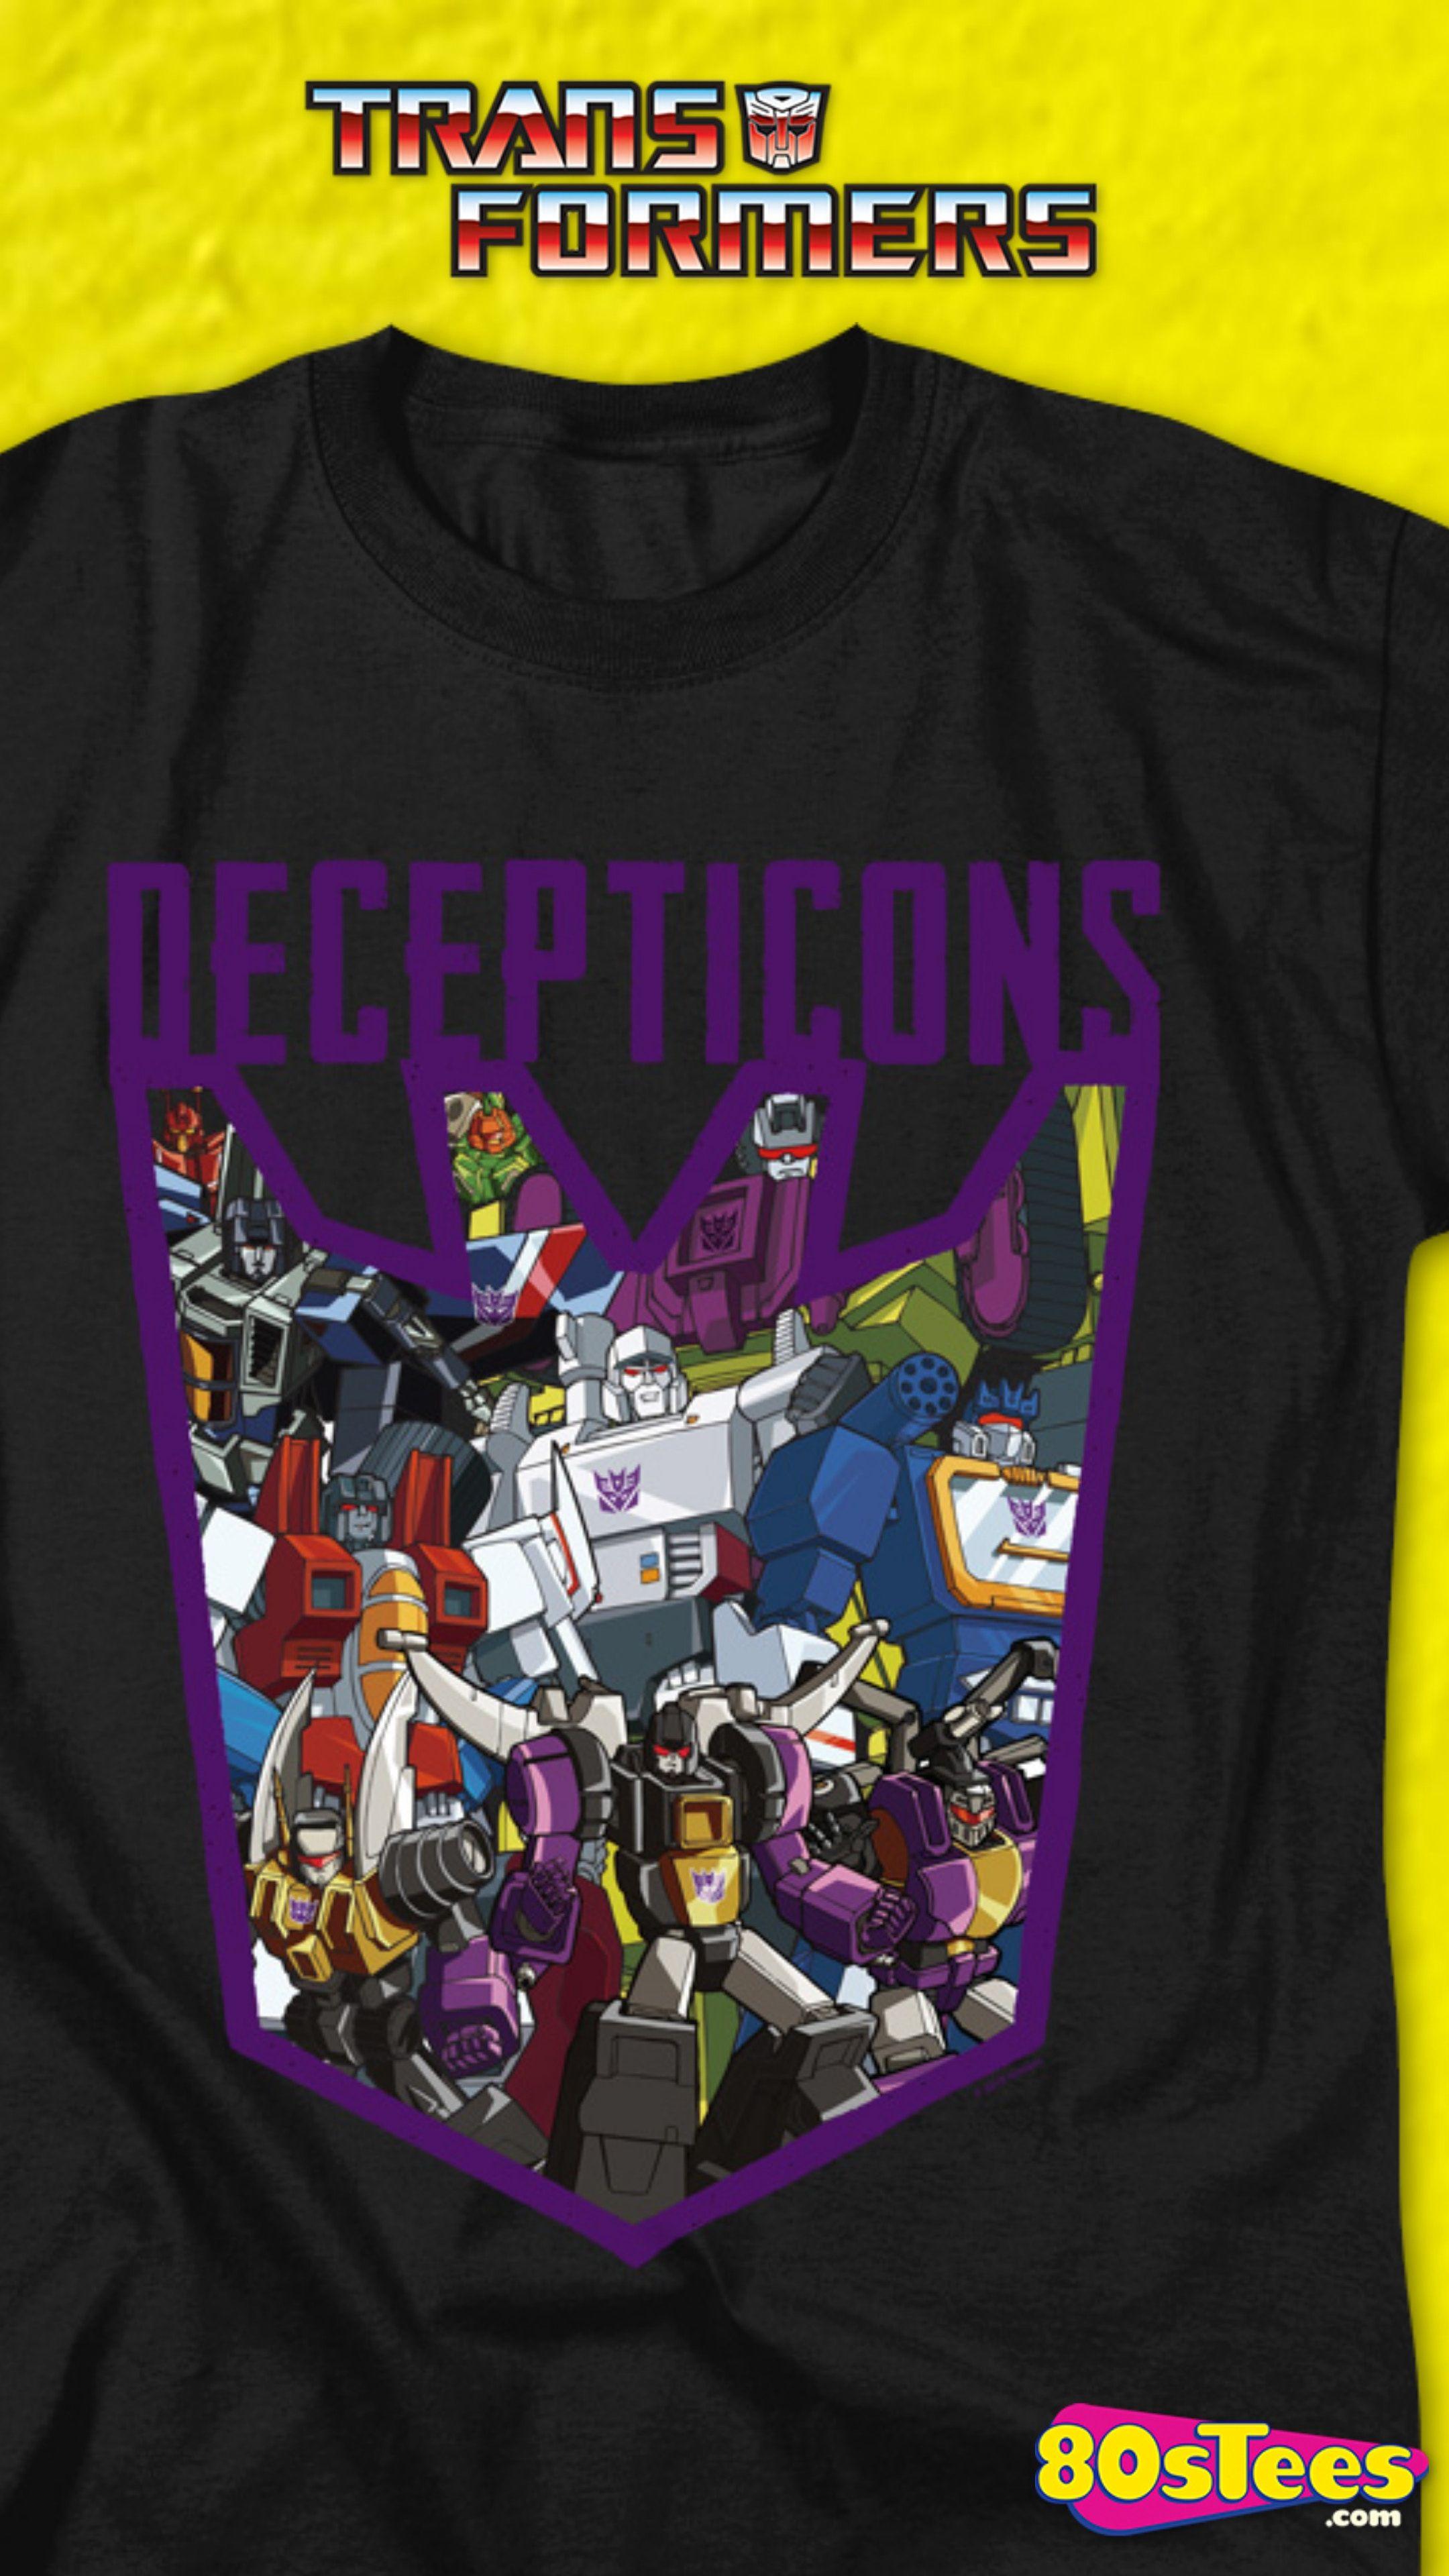 Decepticons Autobots Split Logos Transformers T-Shirt Black S-3XL